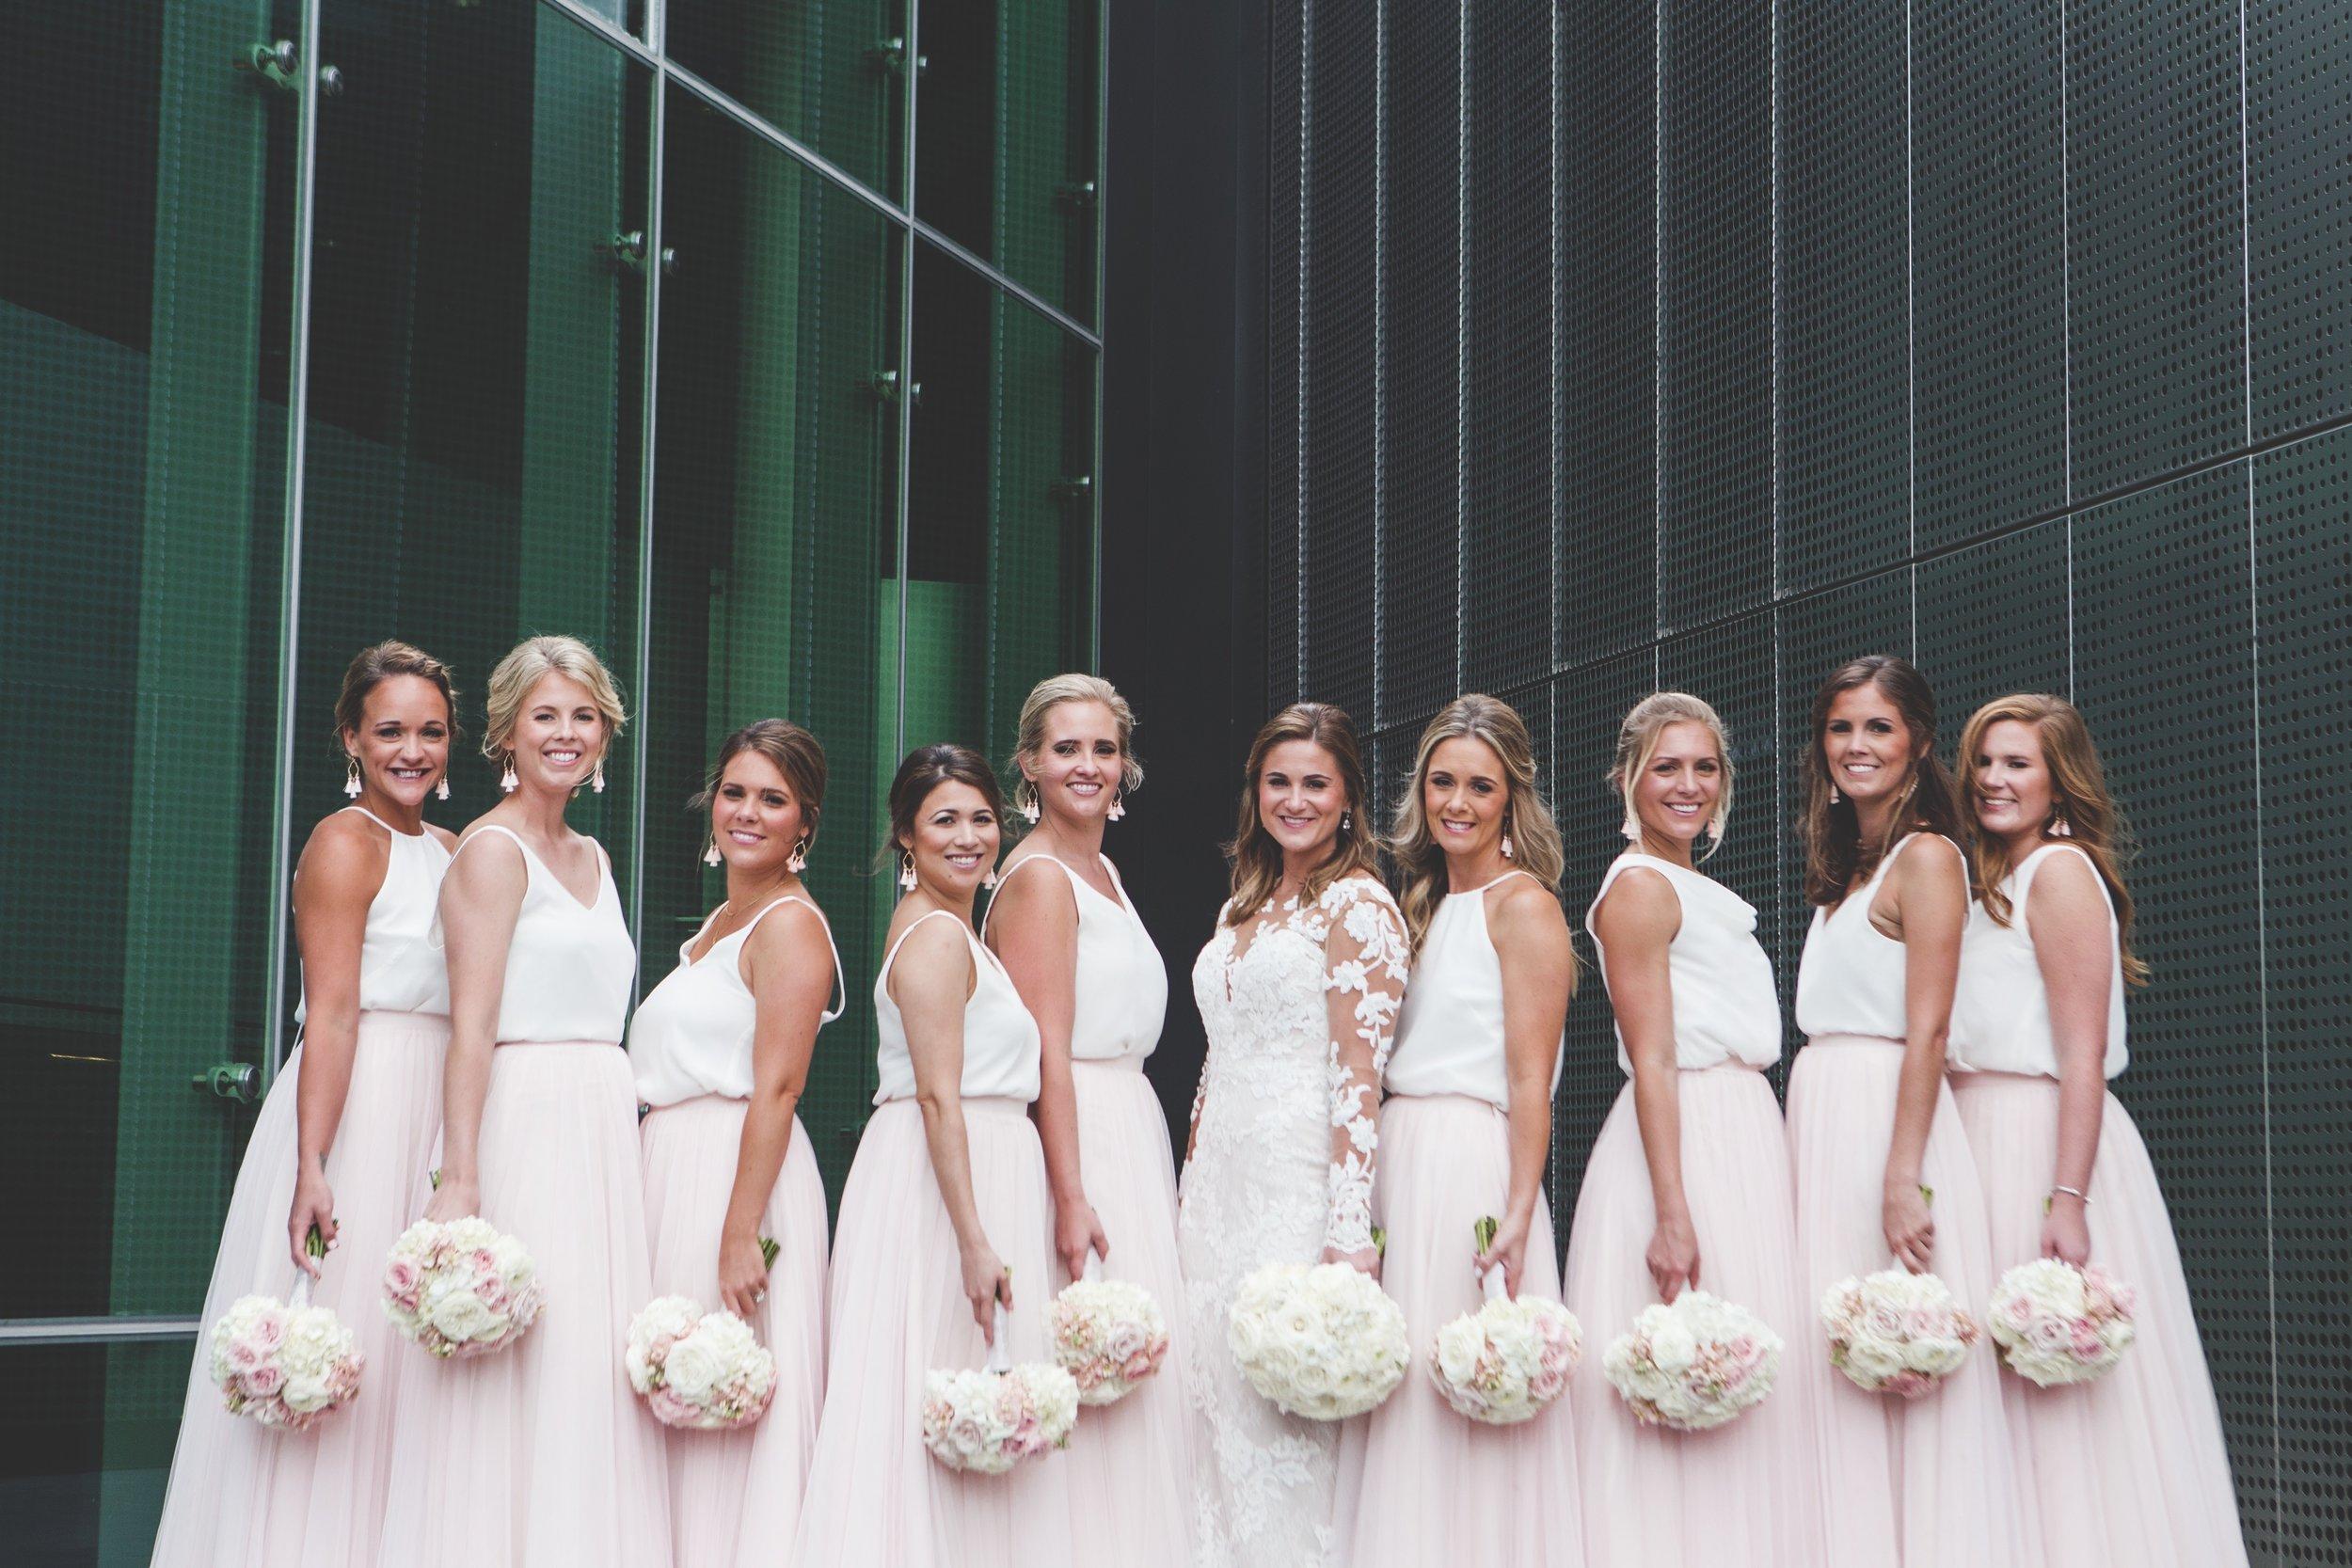 cider-gallery-lawrence-ks-wedding-photographer-jason-domingues-photography-lindsey-paul-0208.jpg